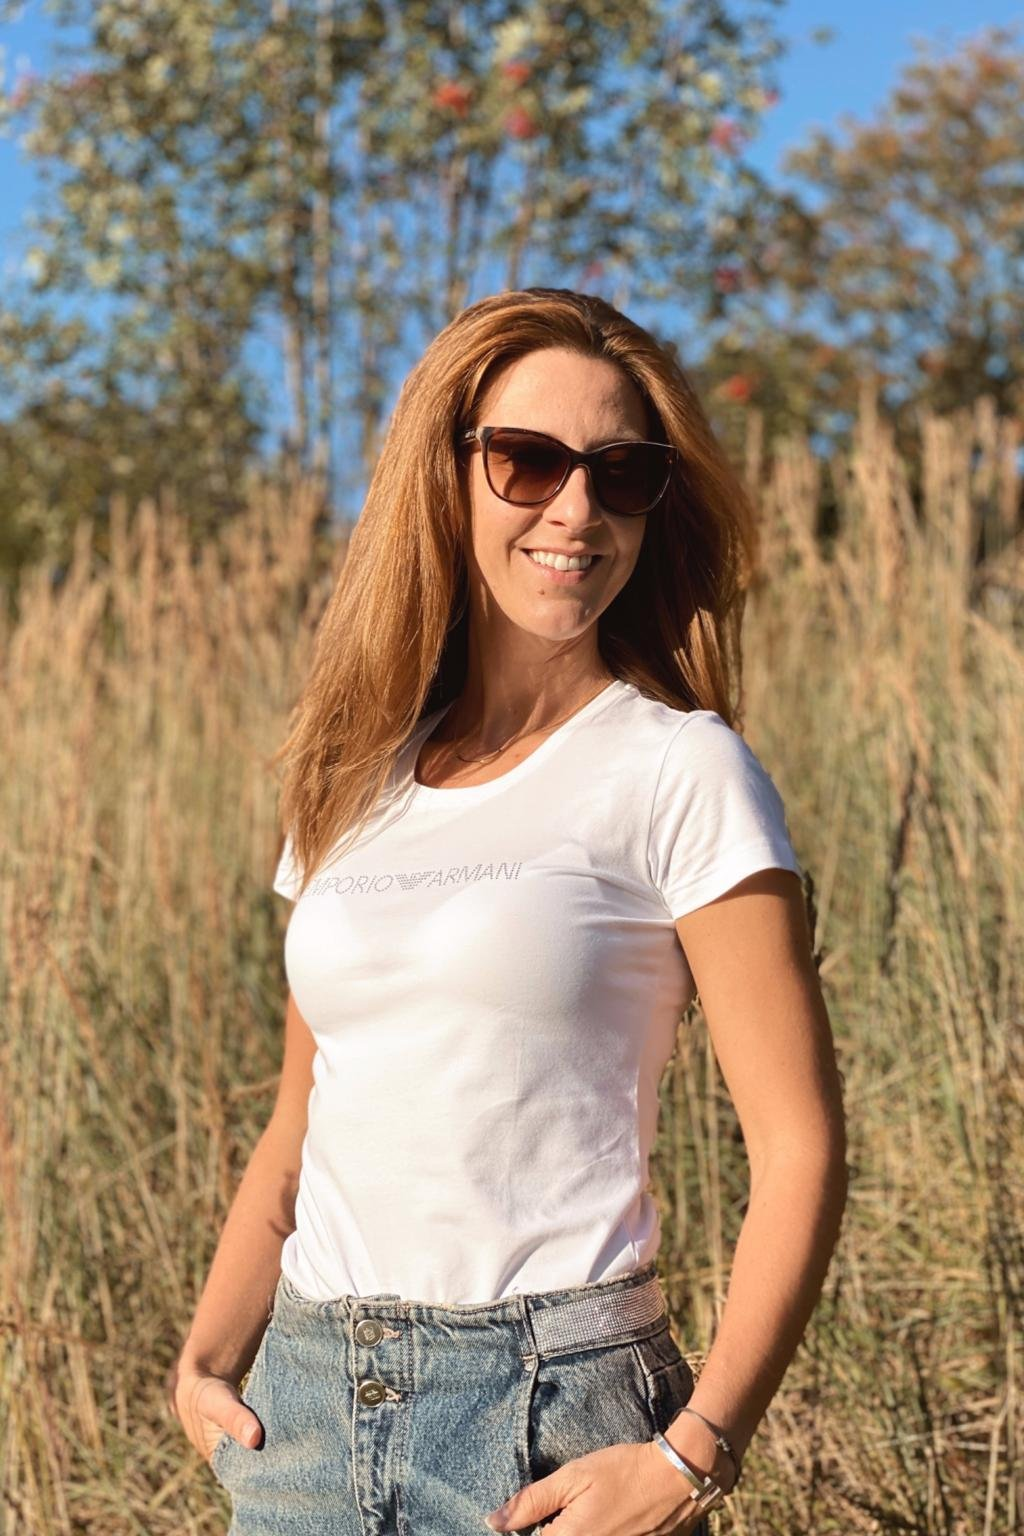 Emporio Armani Neo Romantic tričko s krátkým rukávem dámské - bílé